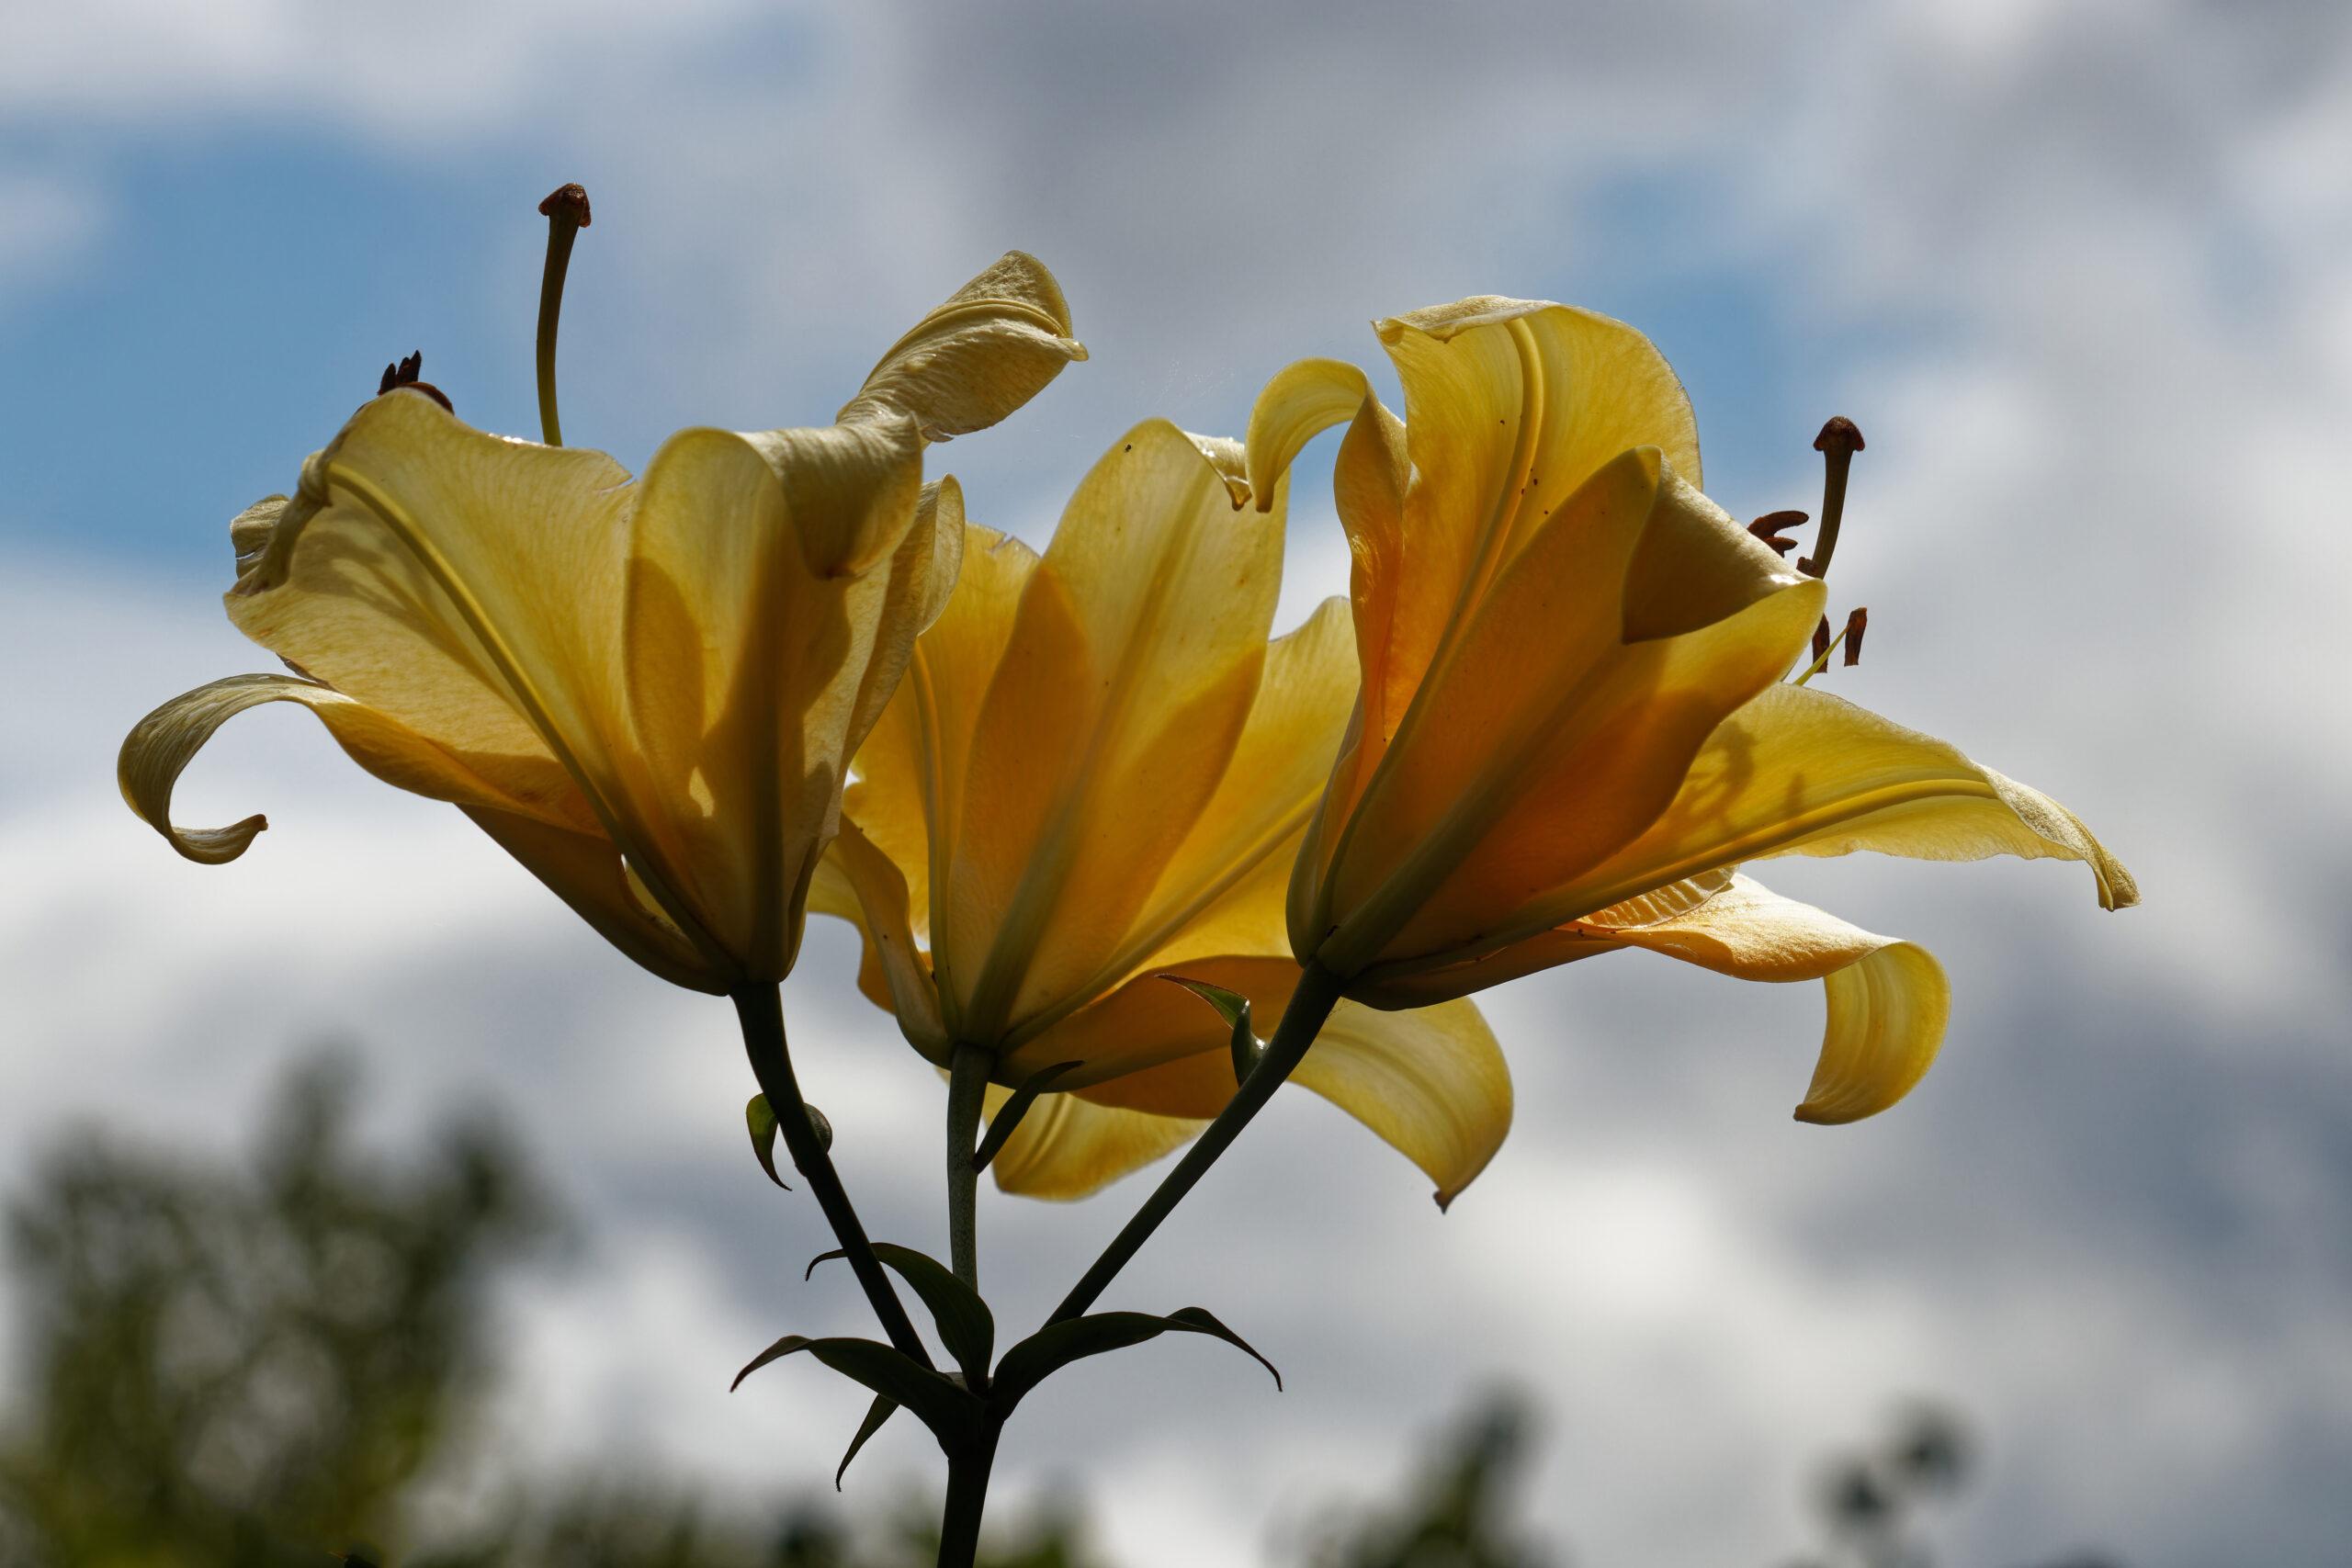 Bodo Jarren- Arboretum Ellerhoop 03.08.2021 - Lilien wollen hoch hinaus